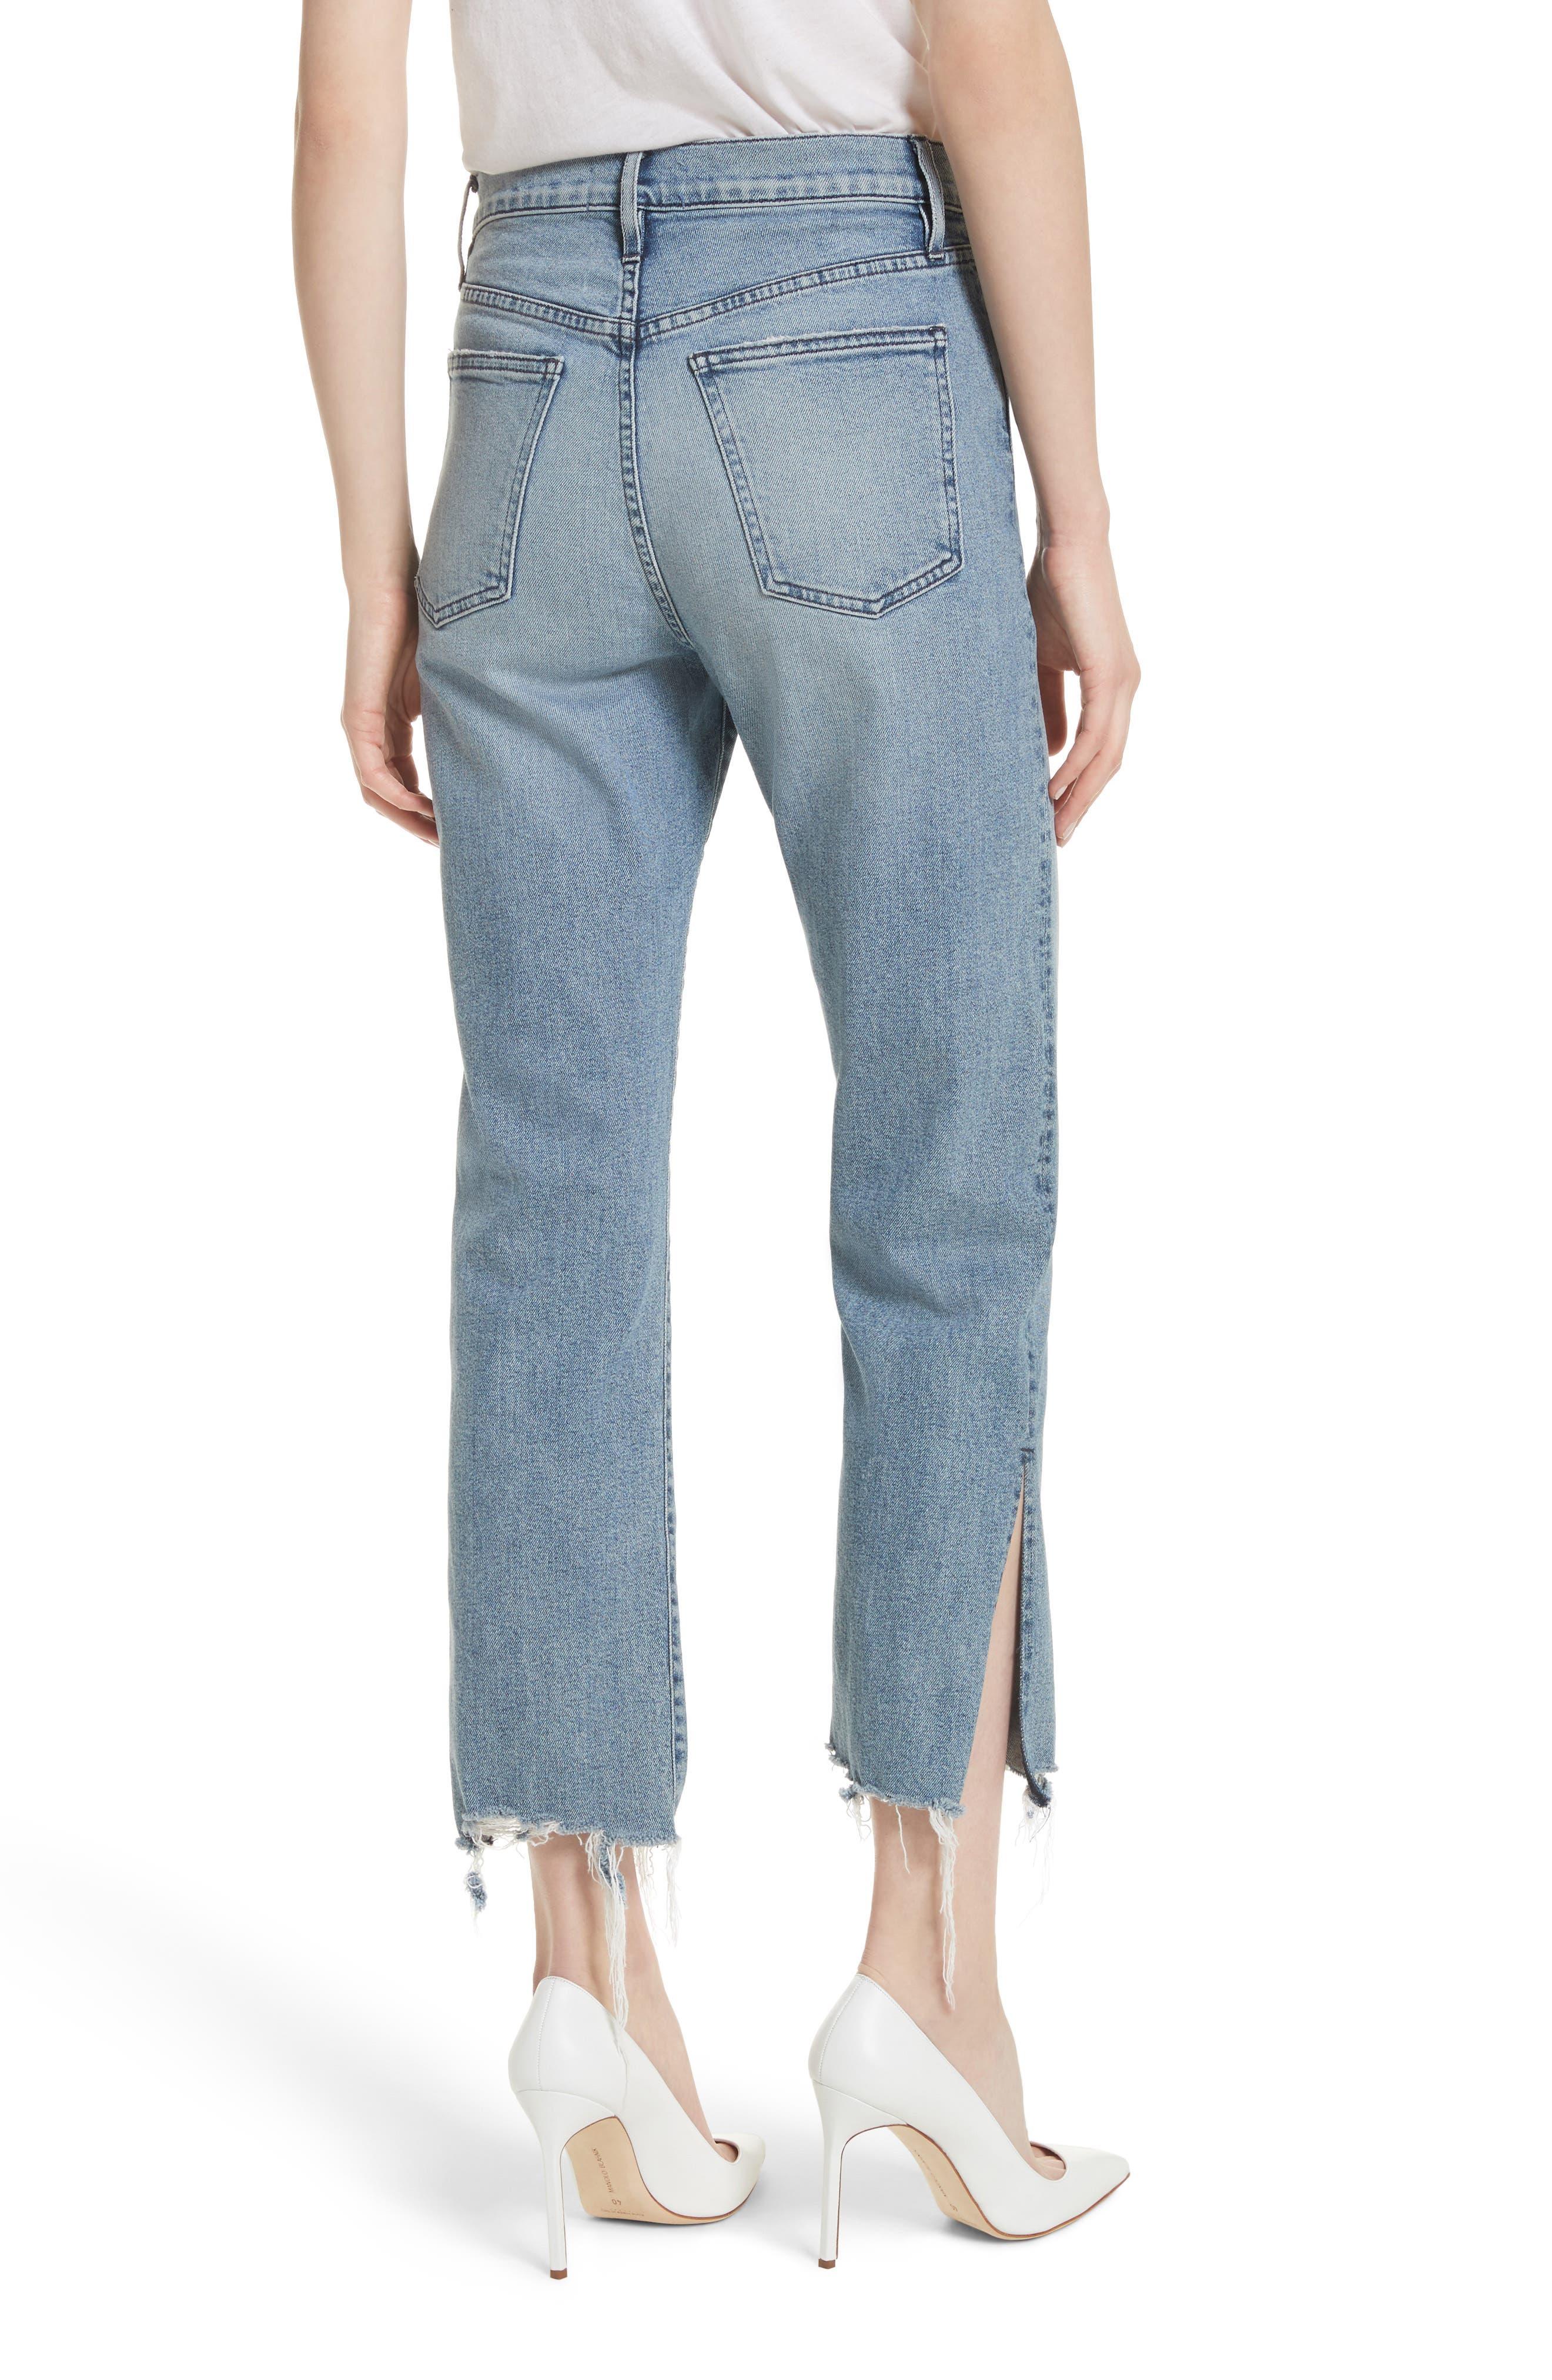 W3 Higher Ground Side Split Ankle Straight Leg Jeans,                             Alternate thumbnail 2, color,                             428